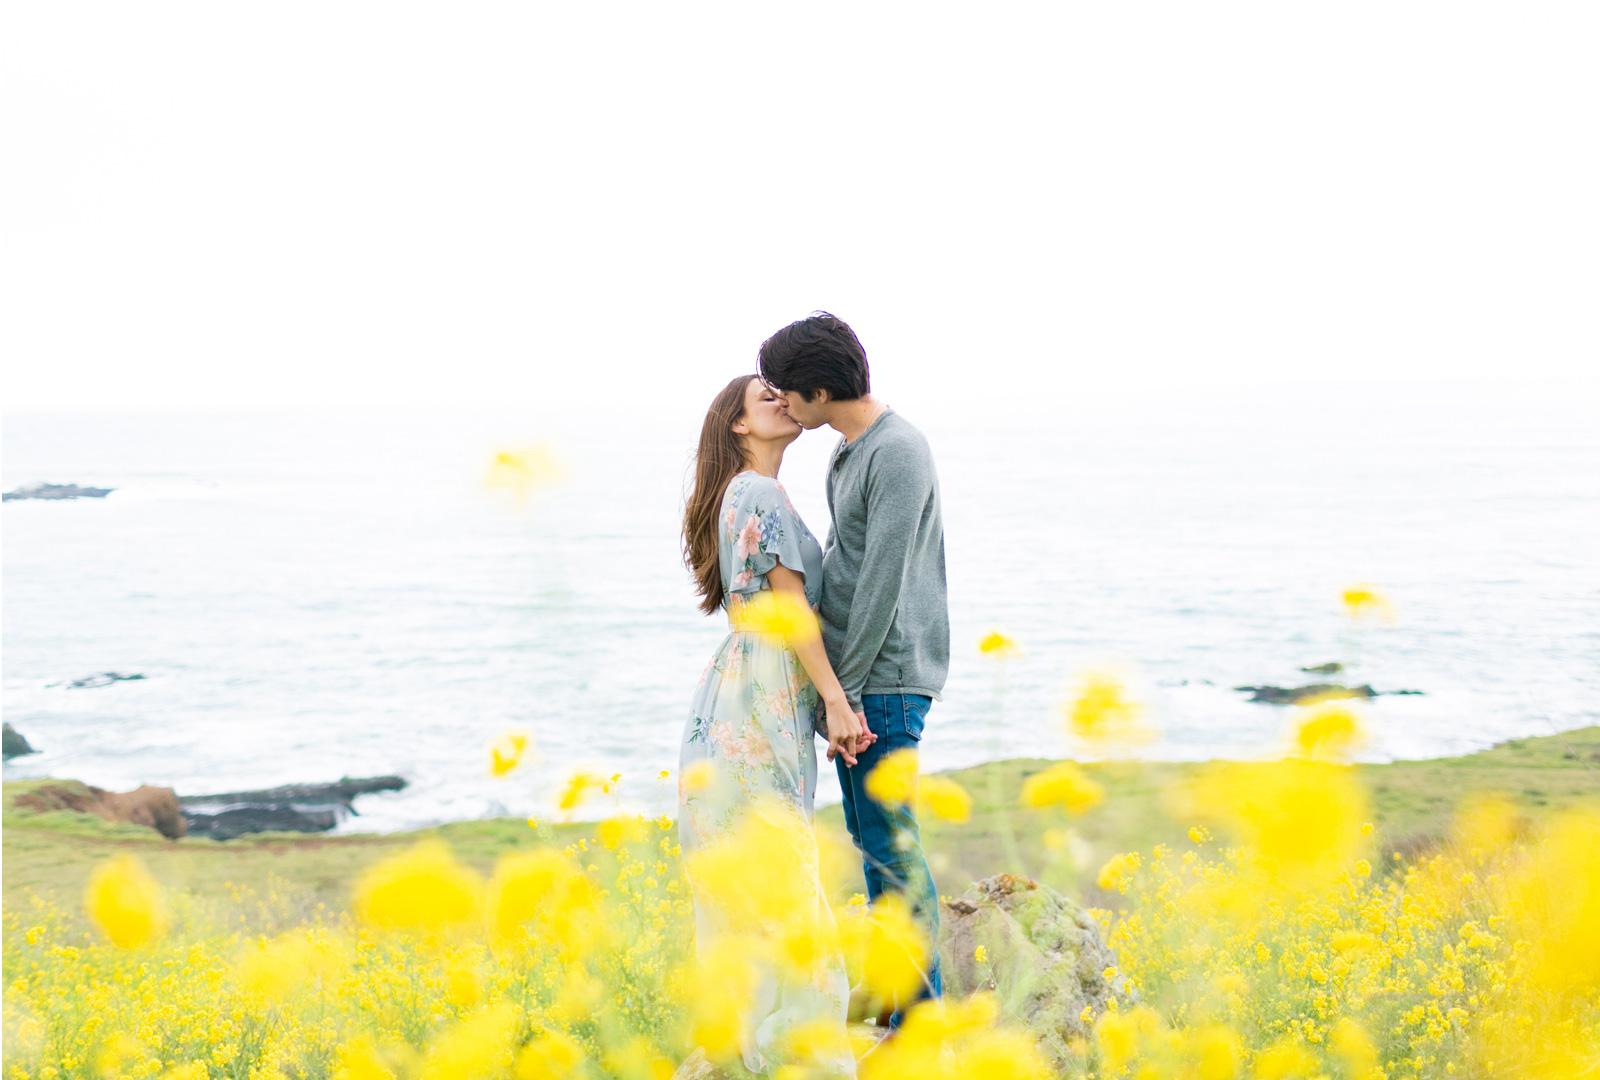 Saddlerock-Ranch-Malibu-Wedding-Natalie-Schutt-Photography-Romantic-Florals-Rolling-Hills-Engagement_17.jpg